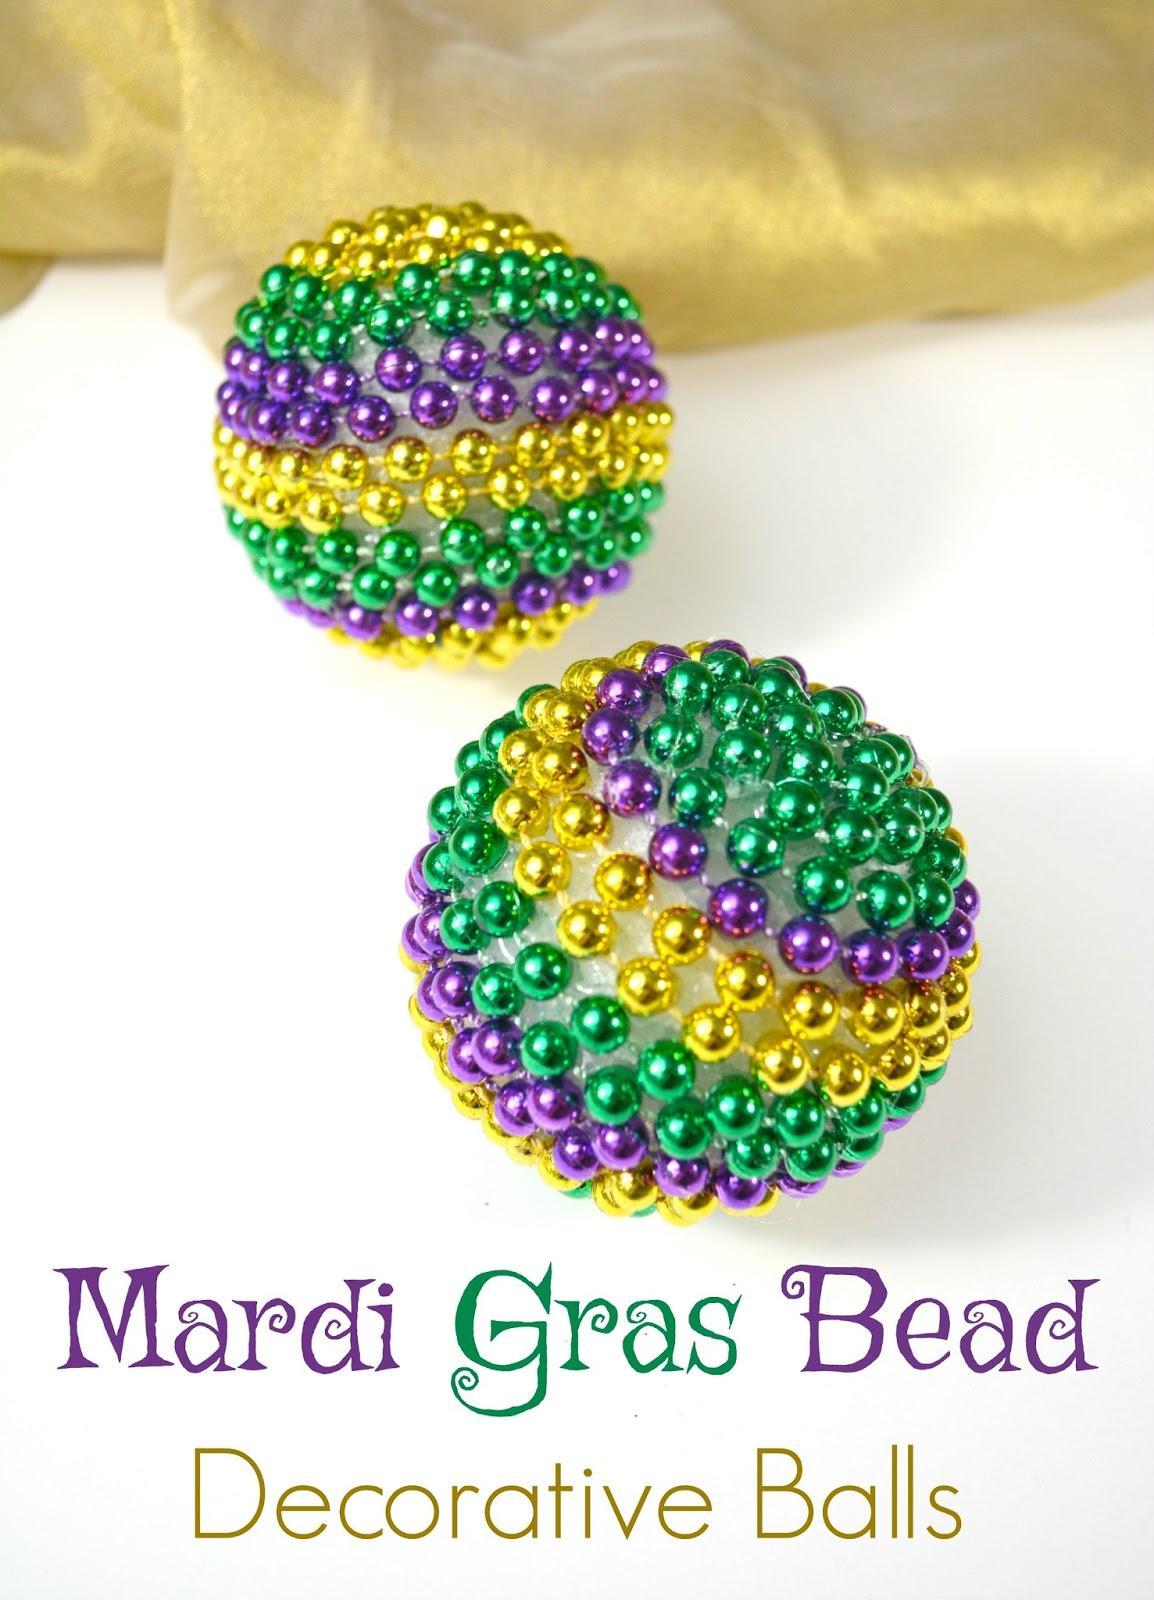 Life With 4 Boys: DIY Mardi Gras Bead Decorations